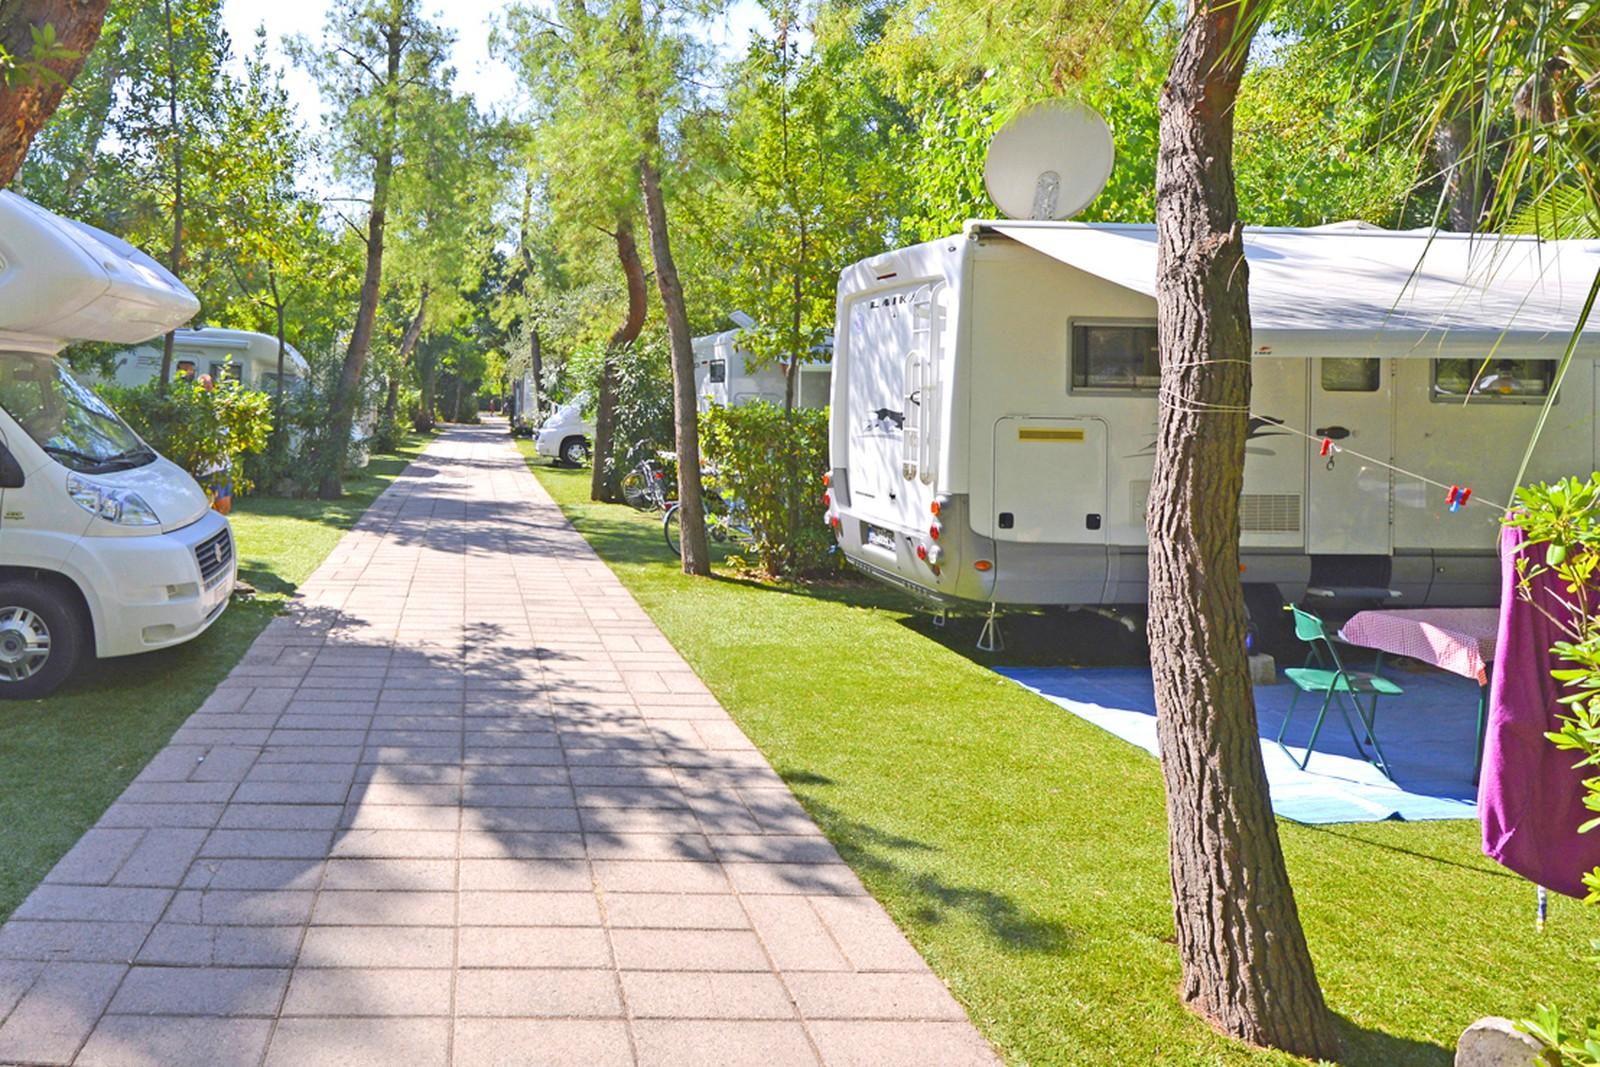 camping allées, emplacements caravane mobil-home